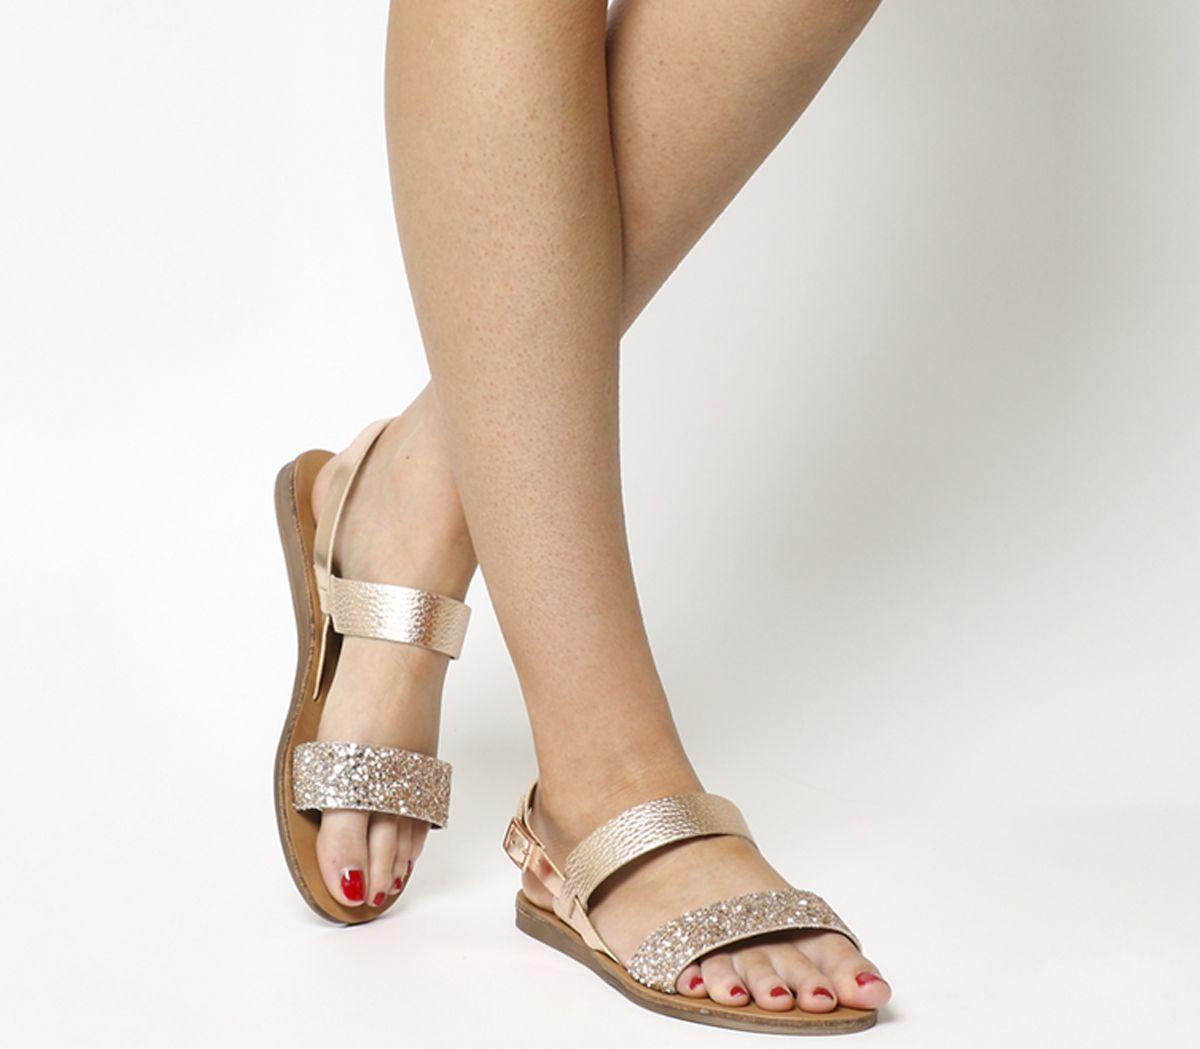 59888dba4 Office Honey Slingback Sandals Rose Gold Leather Glitter - Sandals